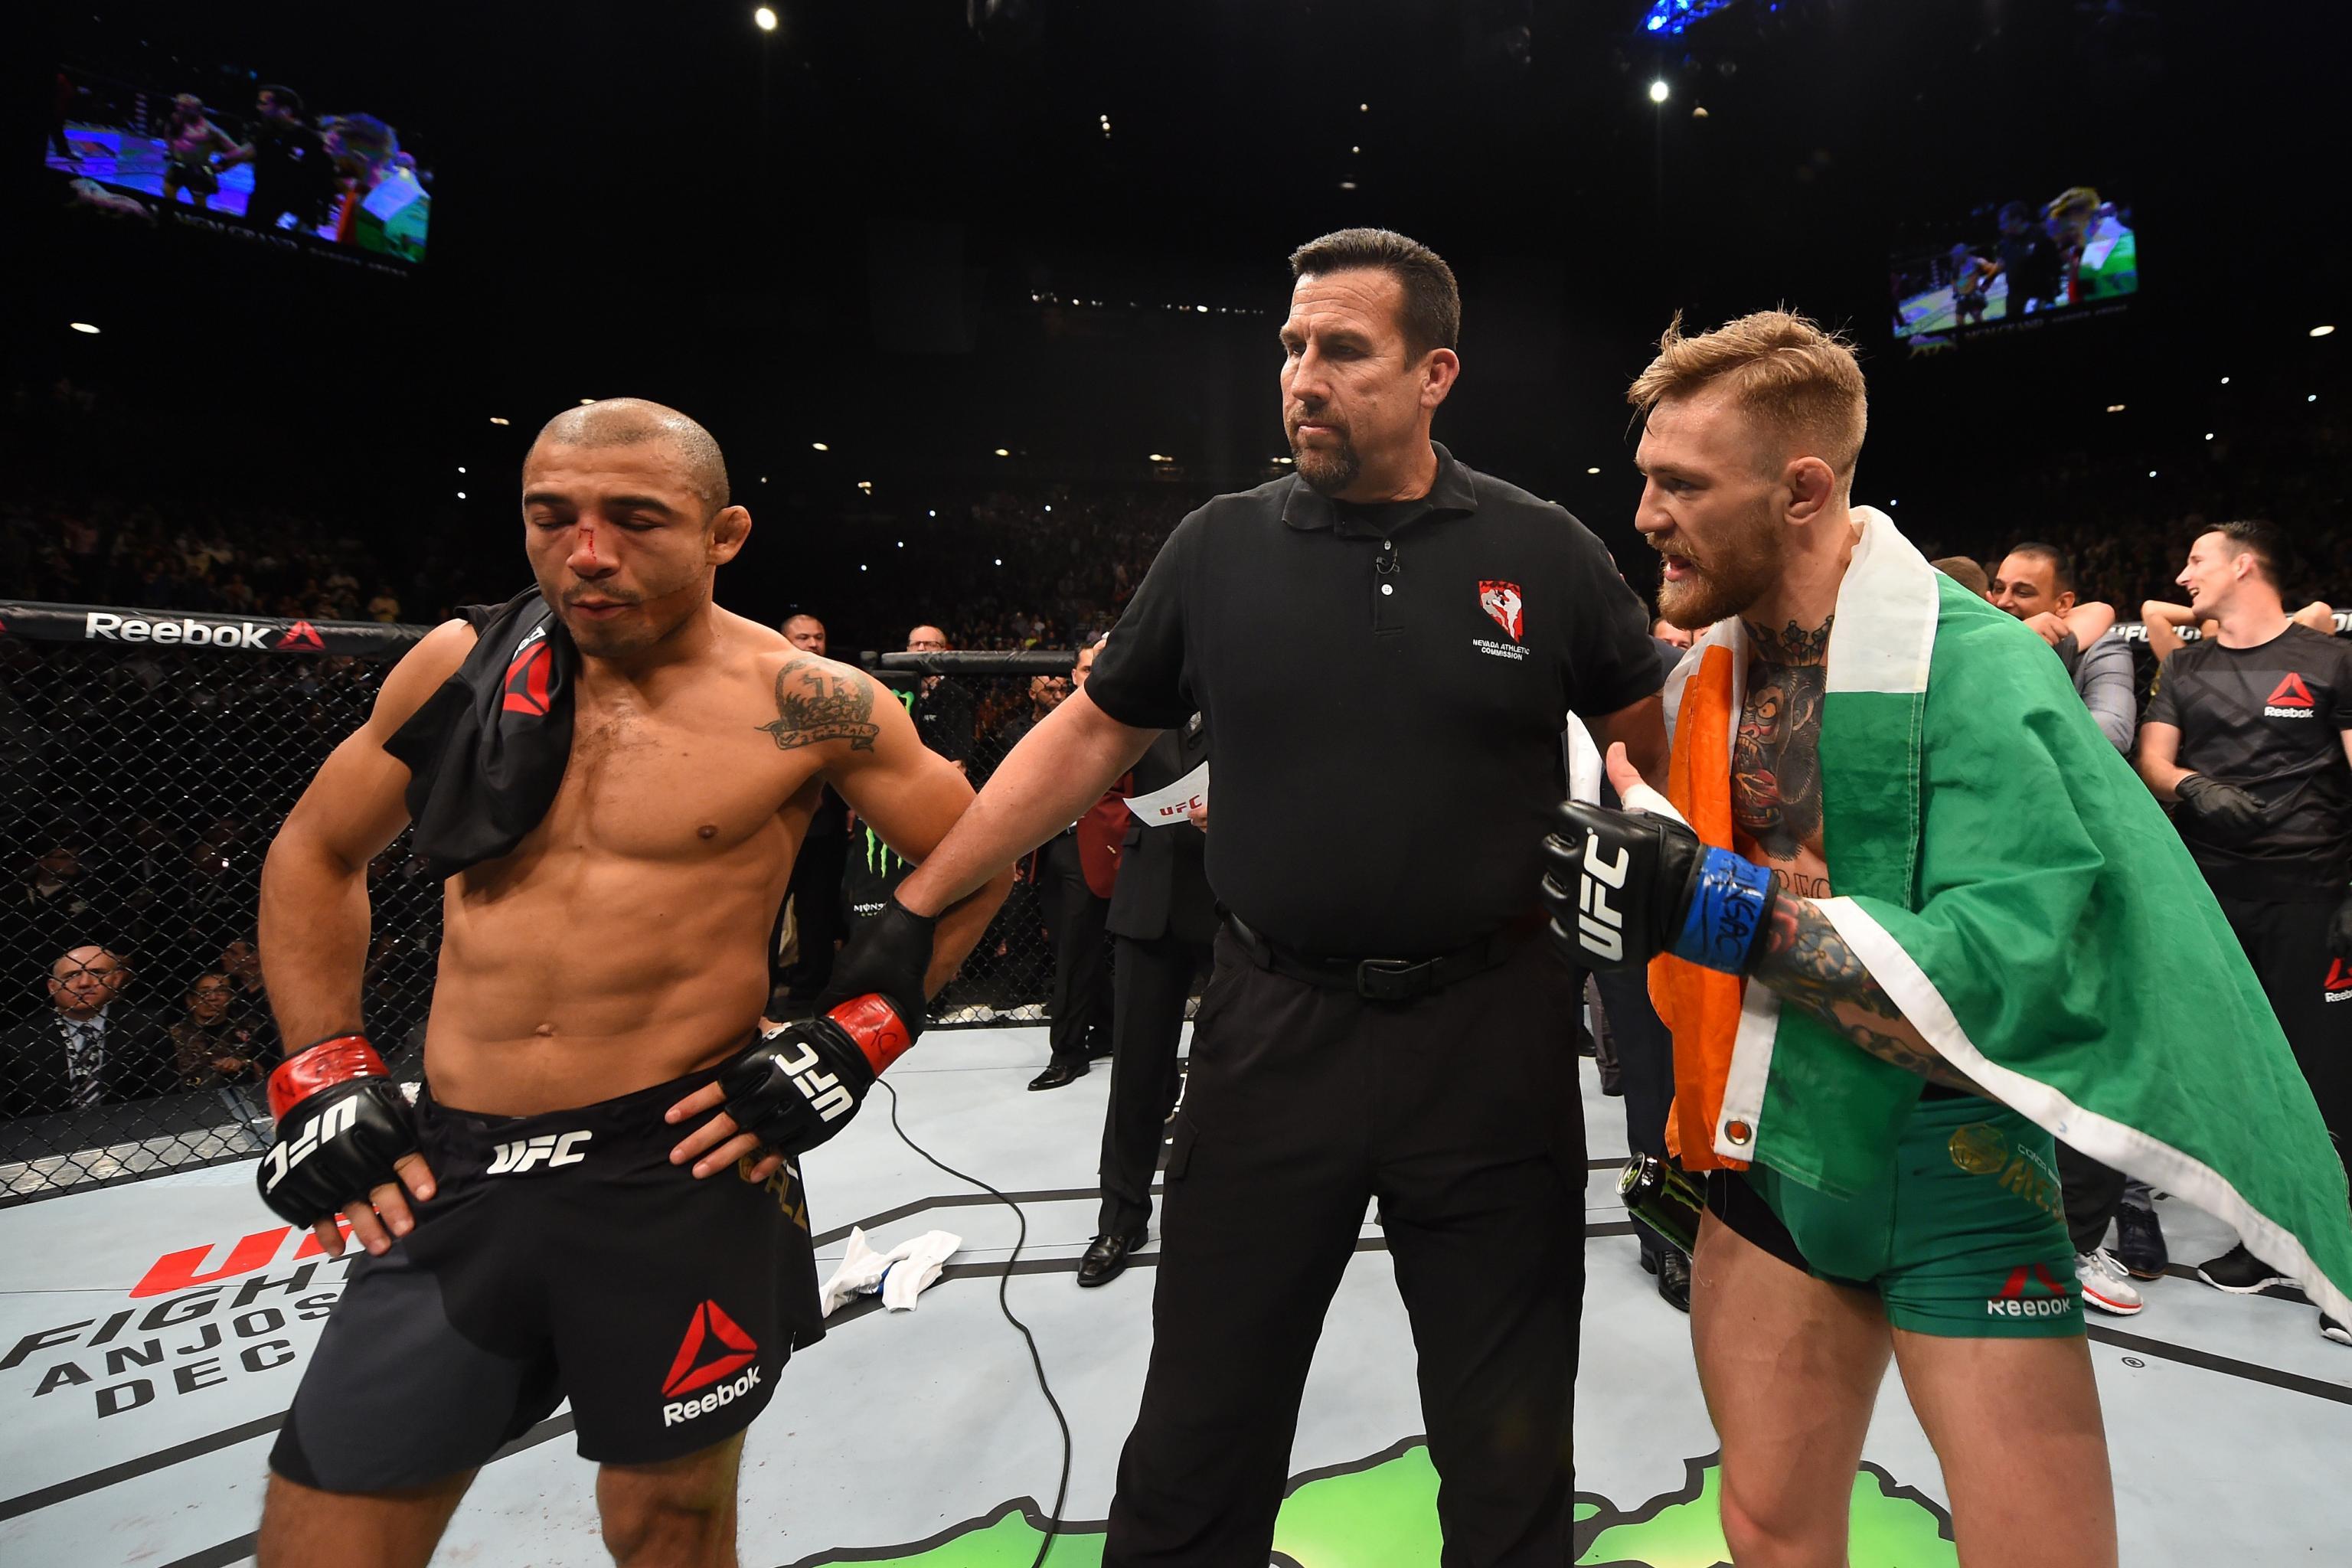 Dana White: Conor McGregor vs. Jose Aldo 2 Will Happen After UFC 202 | Bleacher Report | Latest News, Videos and Highlights